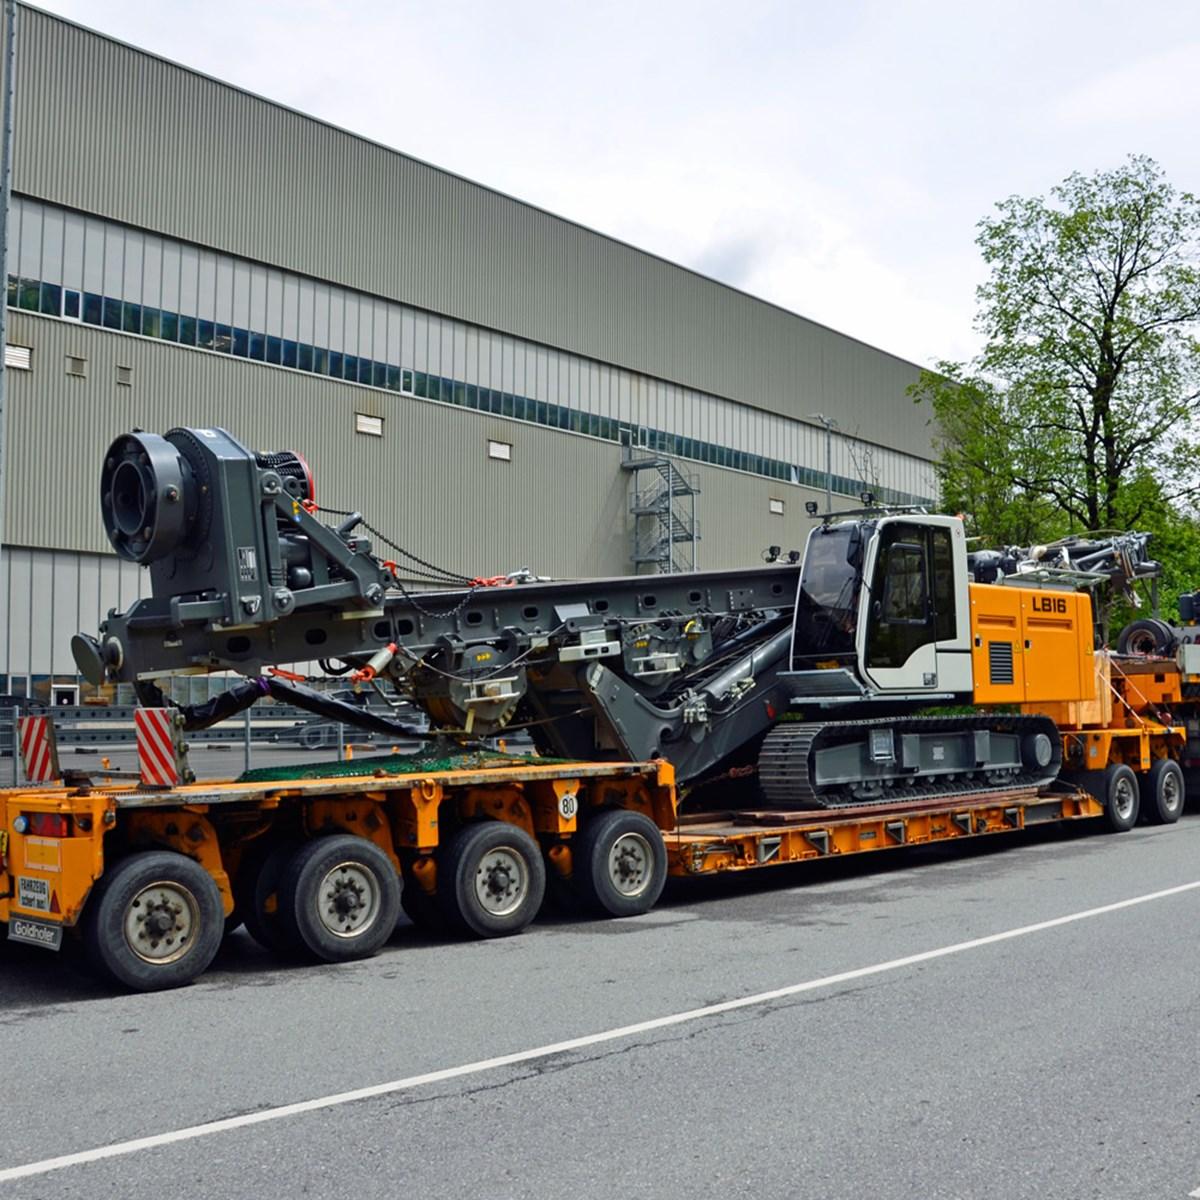 liebherr-bat-180-rotary-drive-bohrantrieb-for-lb-16-drilling-rig-kelly-drill-2.jpg